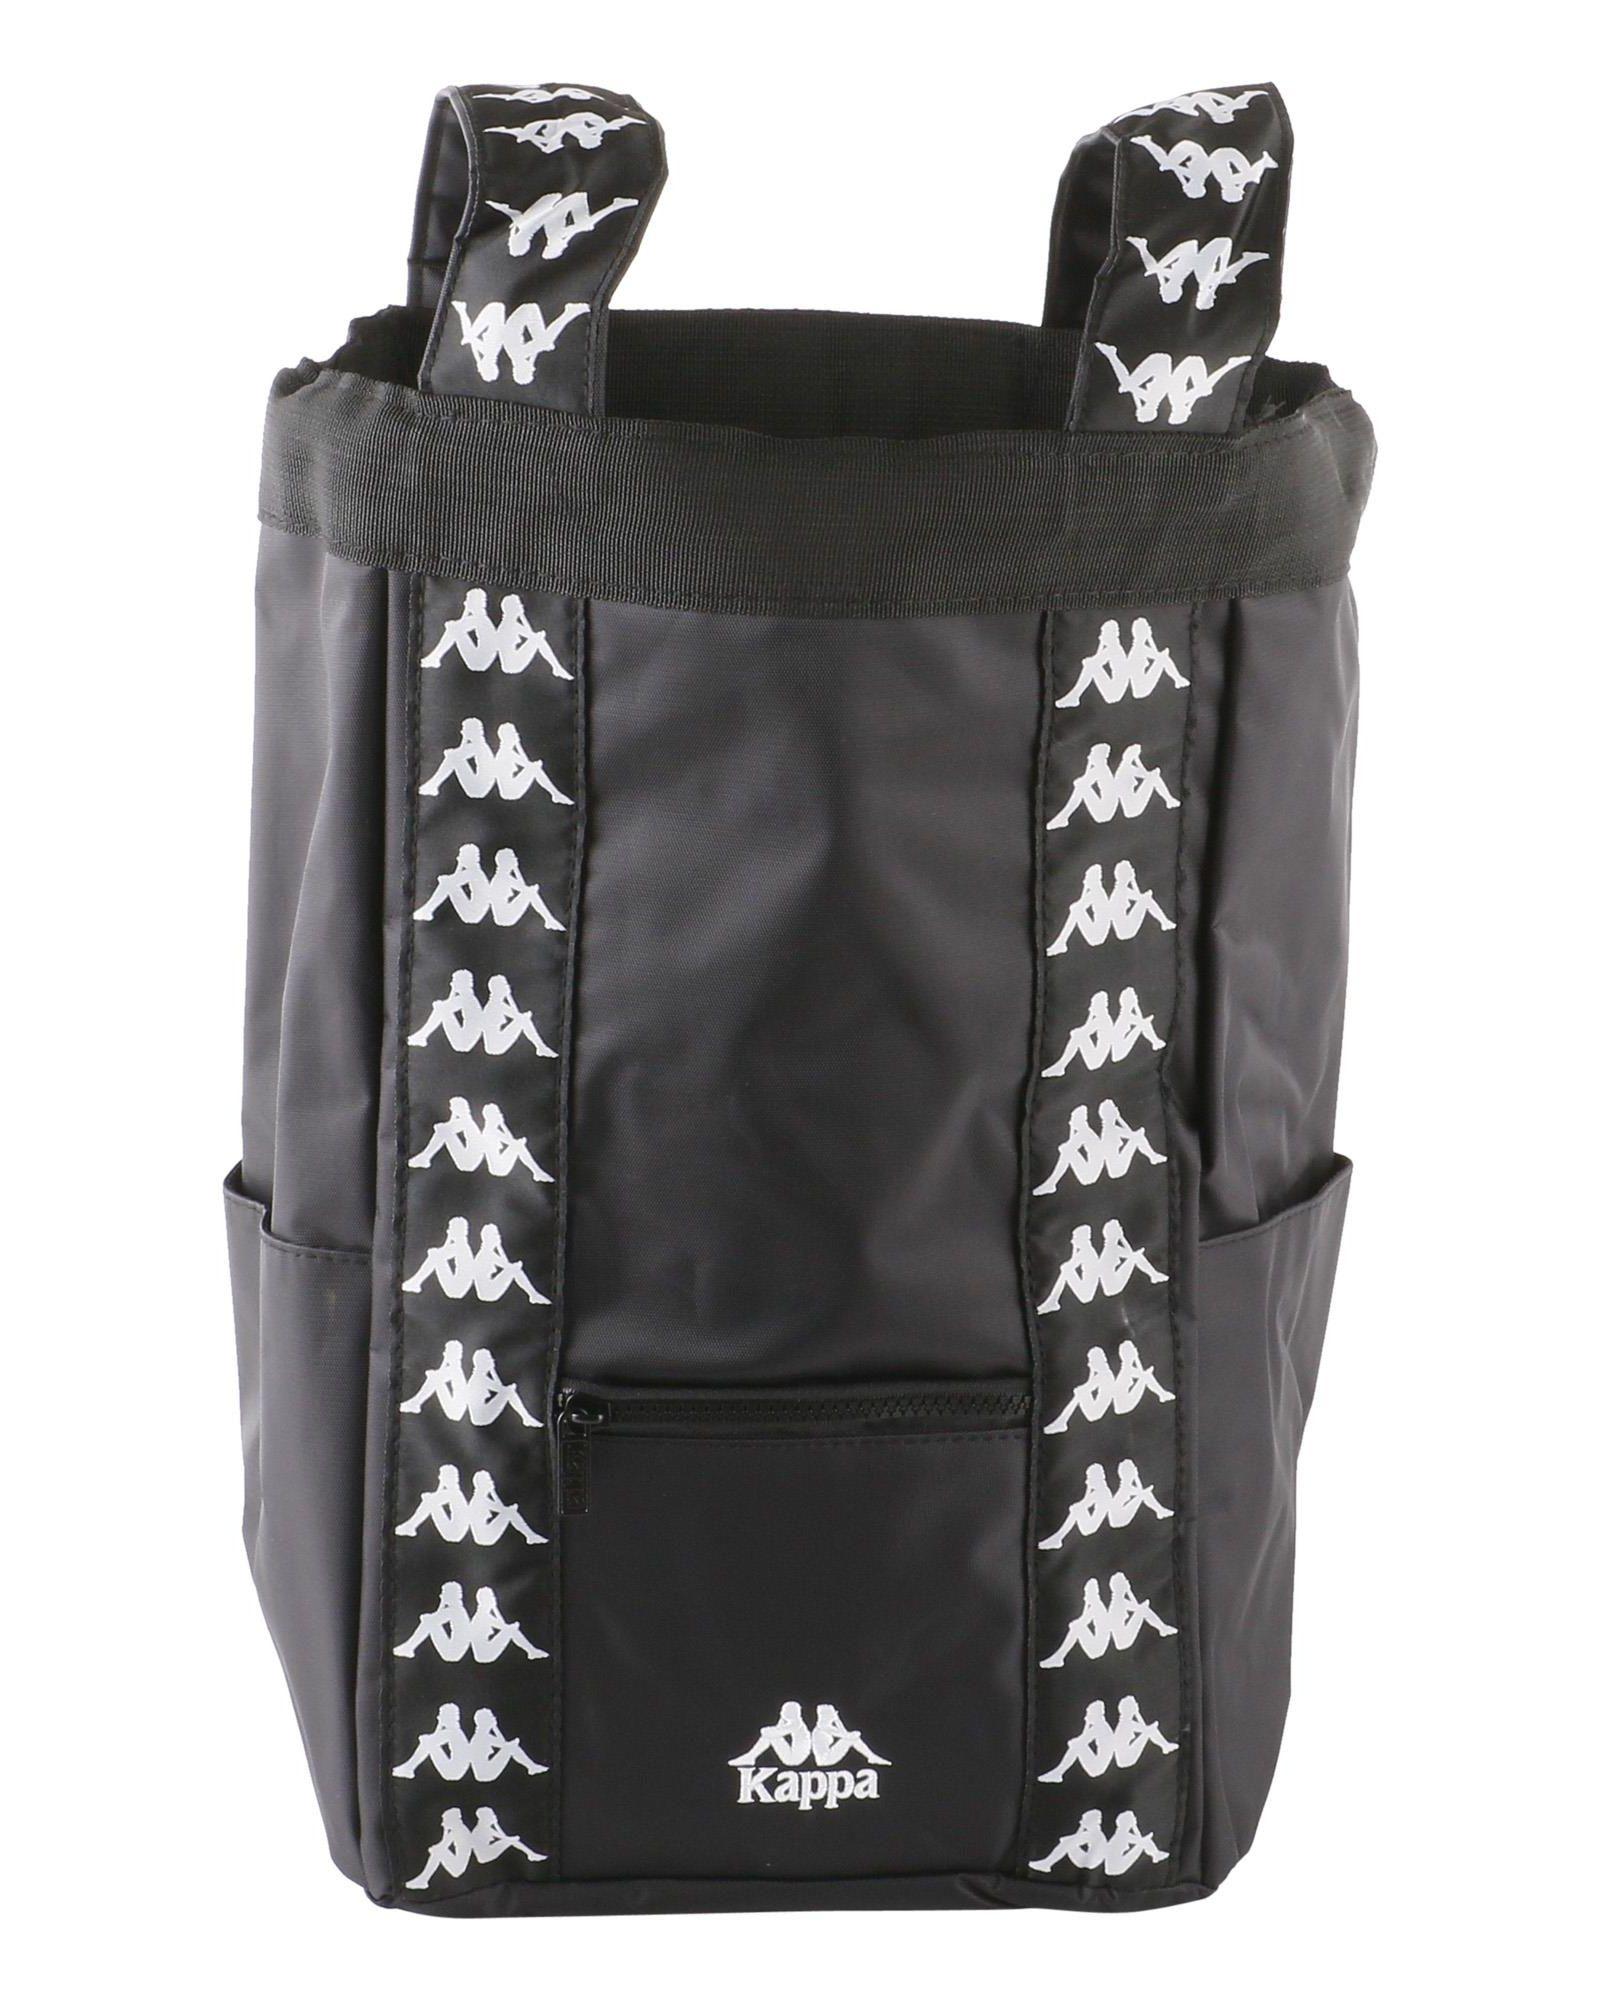 "Banda Aninges"" Backpack"", Black"